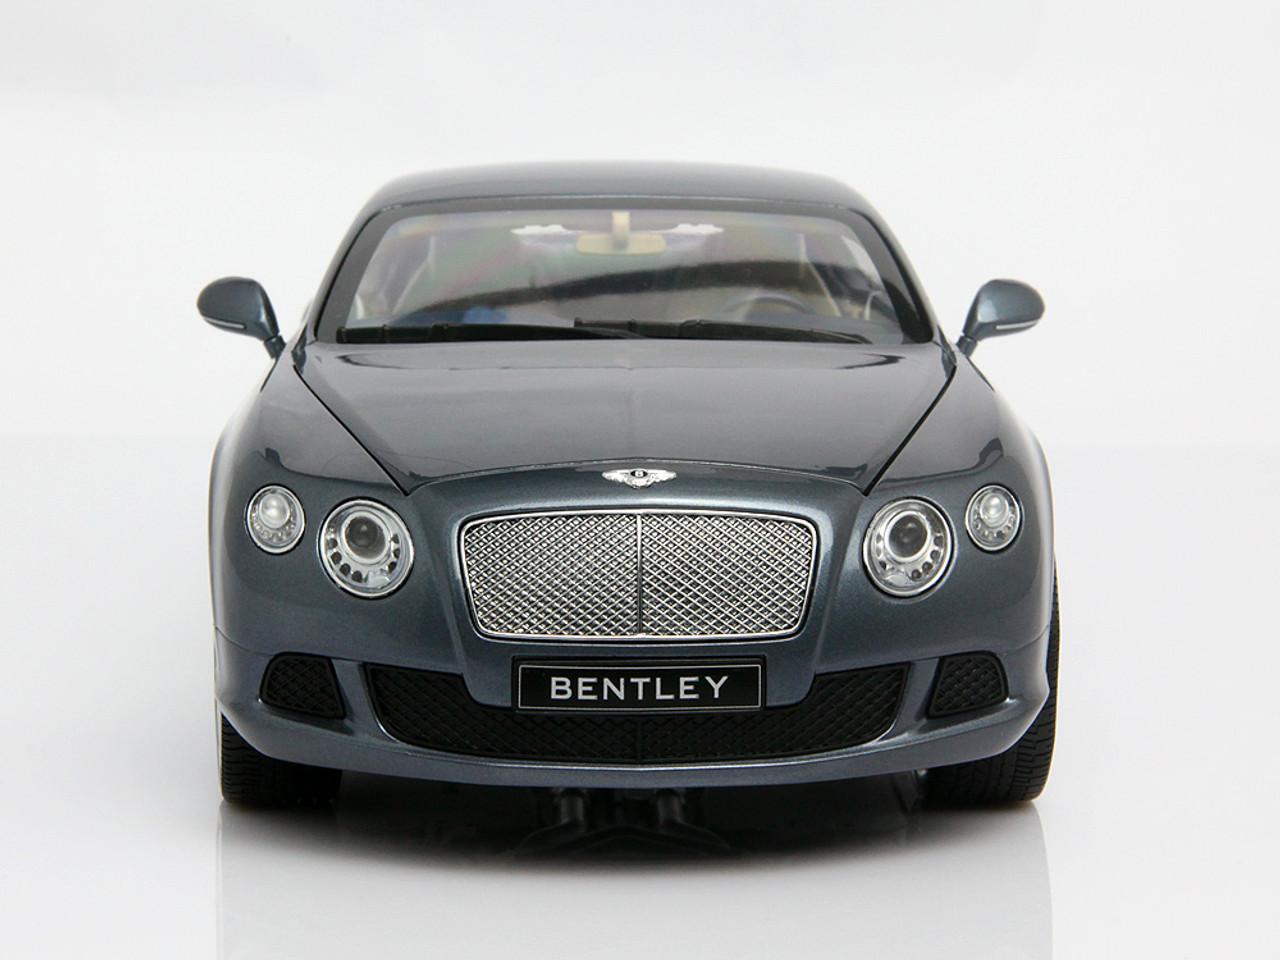 1/18 Minichamps Bentley Continental GT (Grey) Diecast Car Model